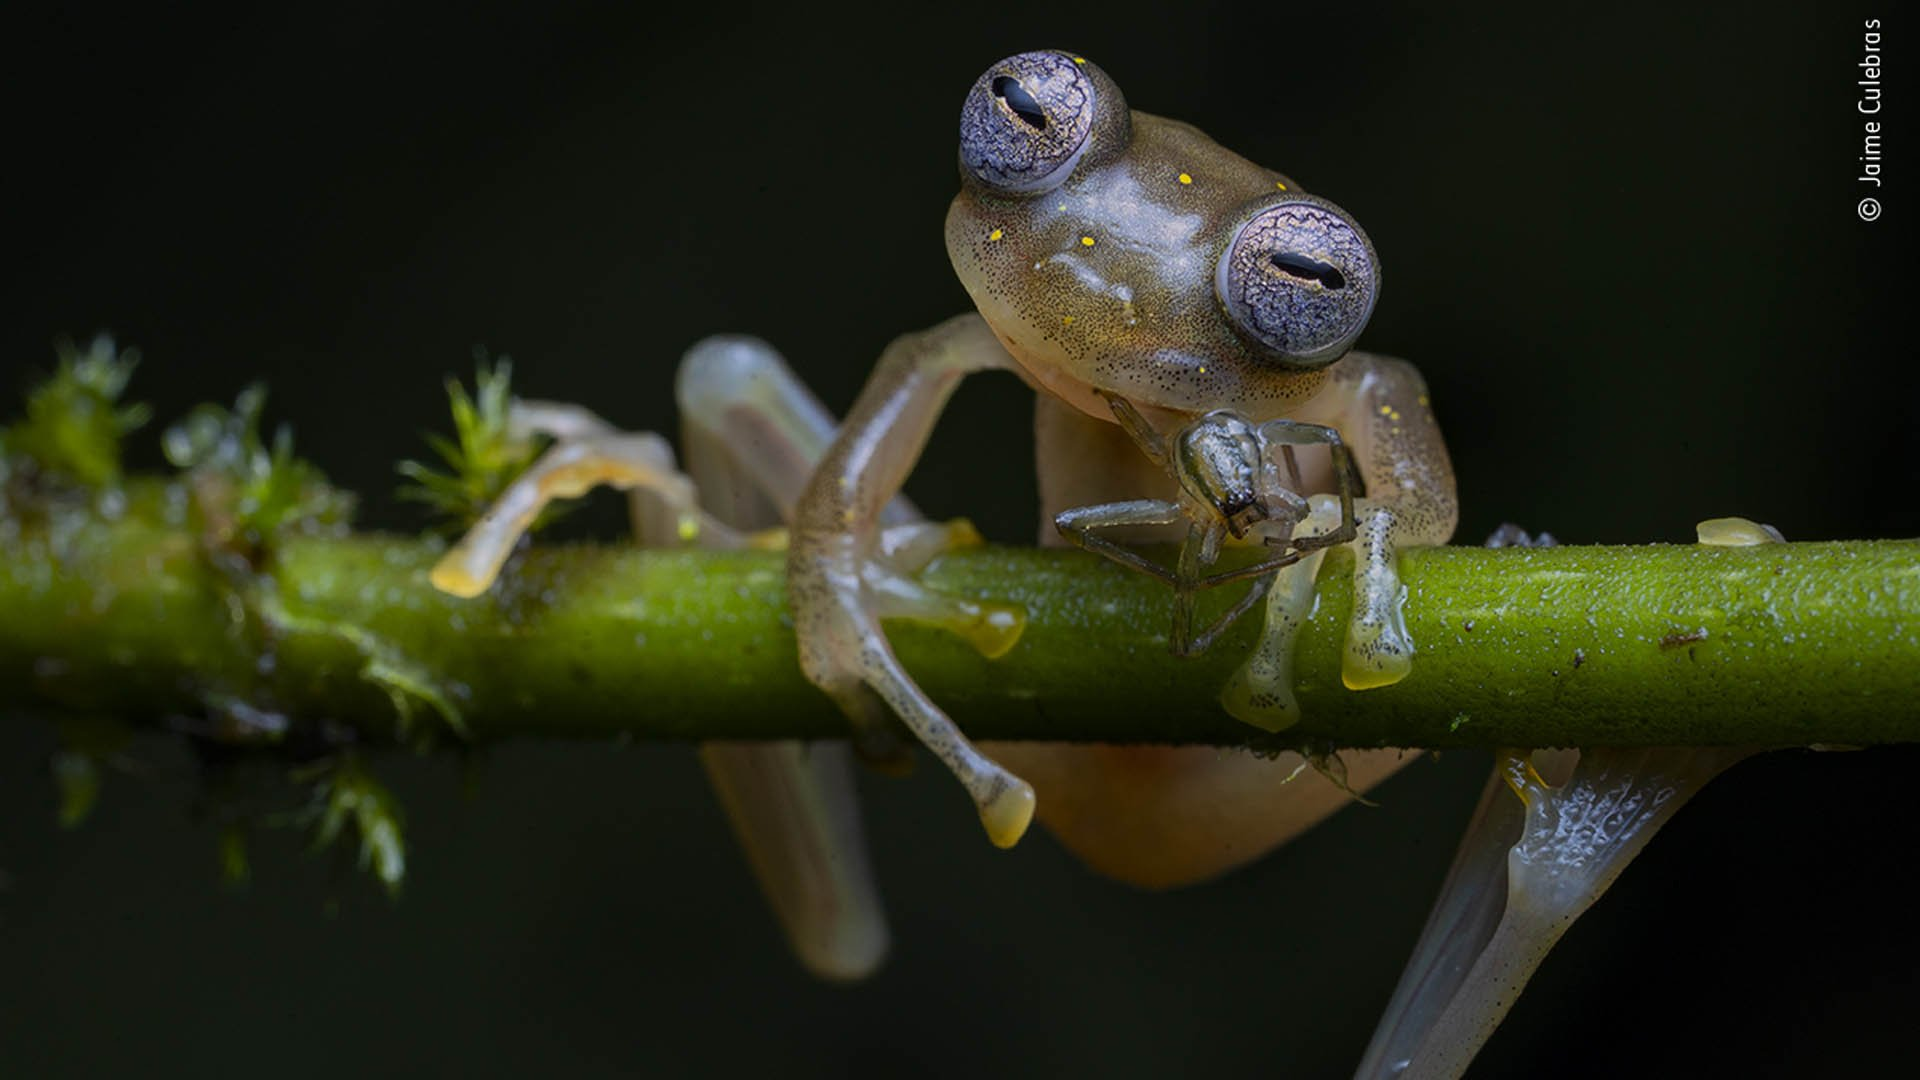 © Jaime Culebras, Wildlife Photographer of the Year 2020